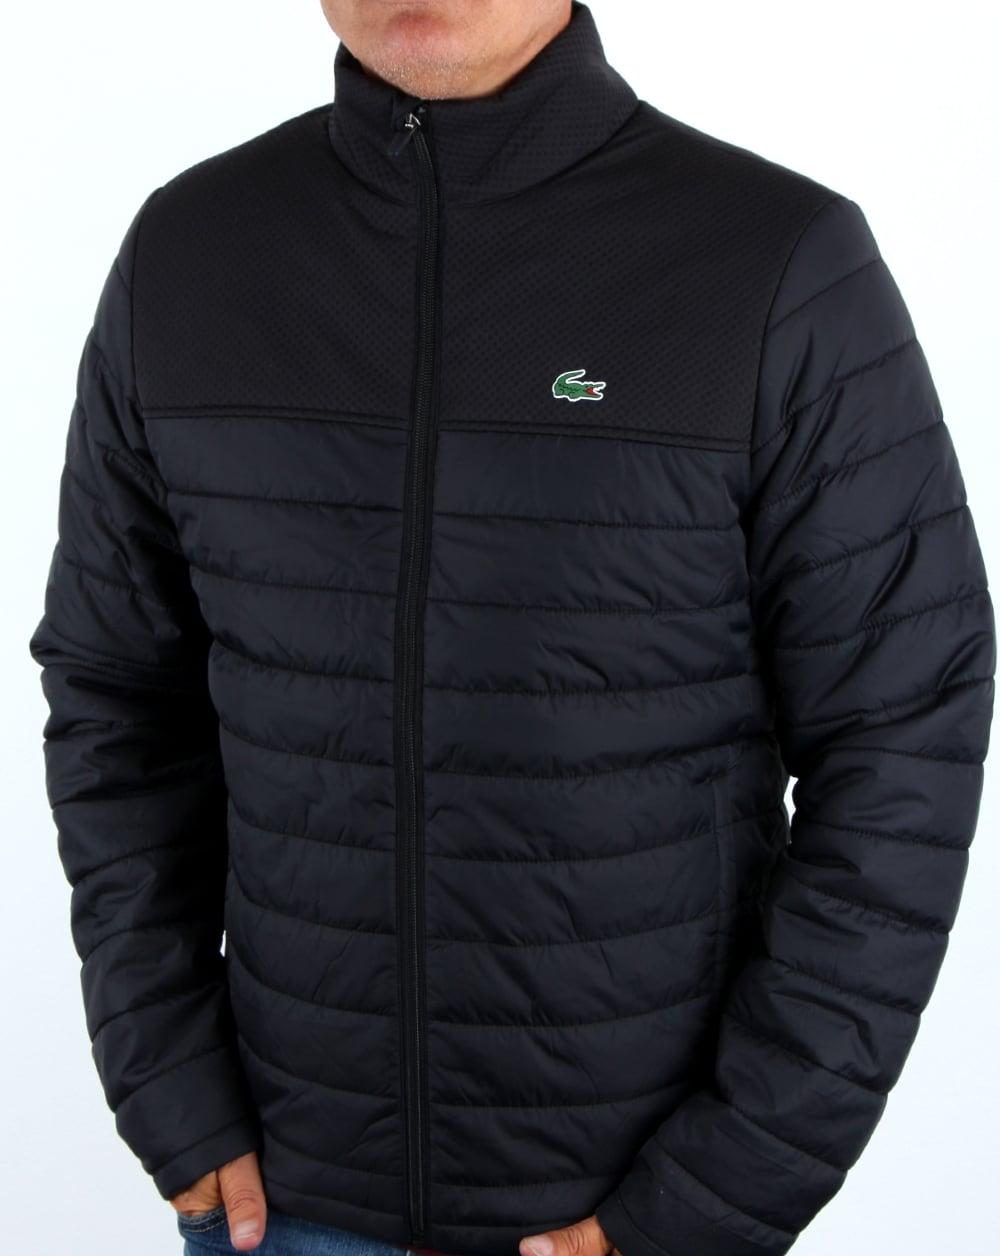 lacoste puffer jacket black men 39 s coat padded quilted. Black Bedroom Furniture Sets. Home Design Ideas